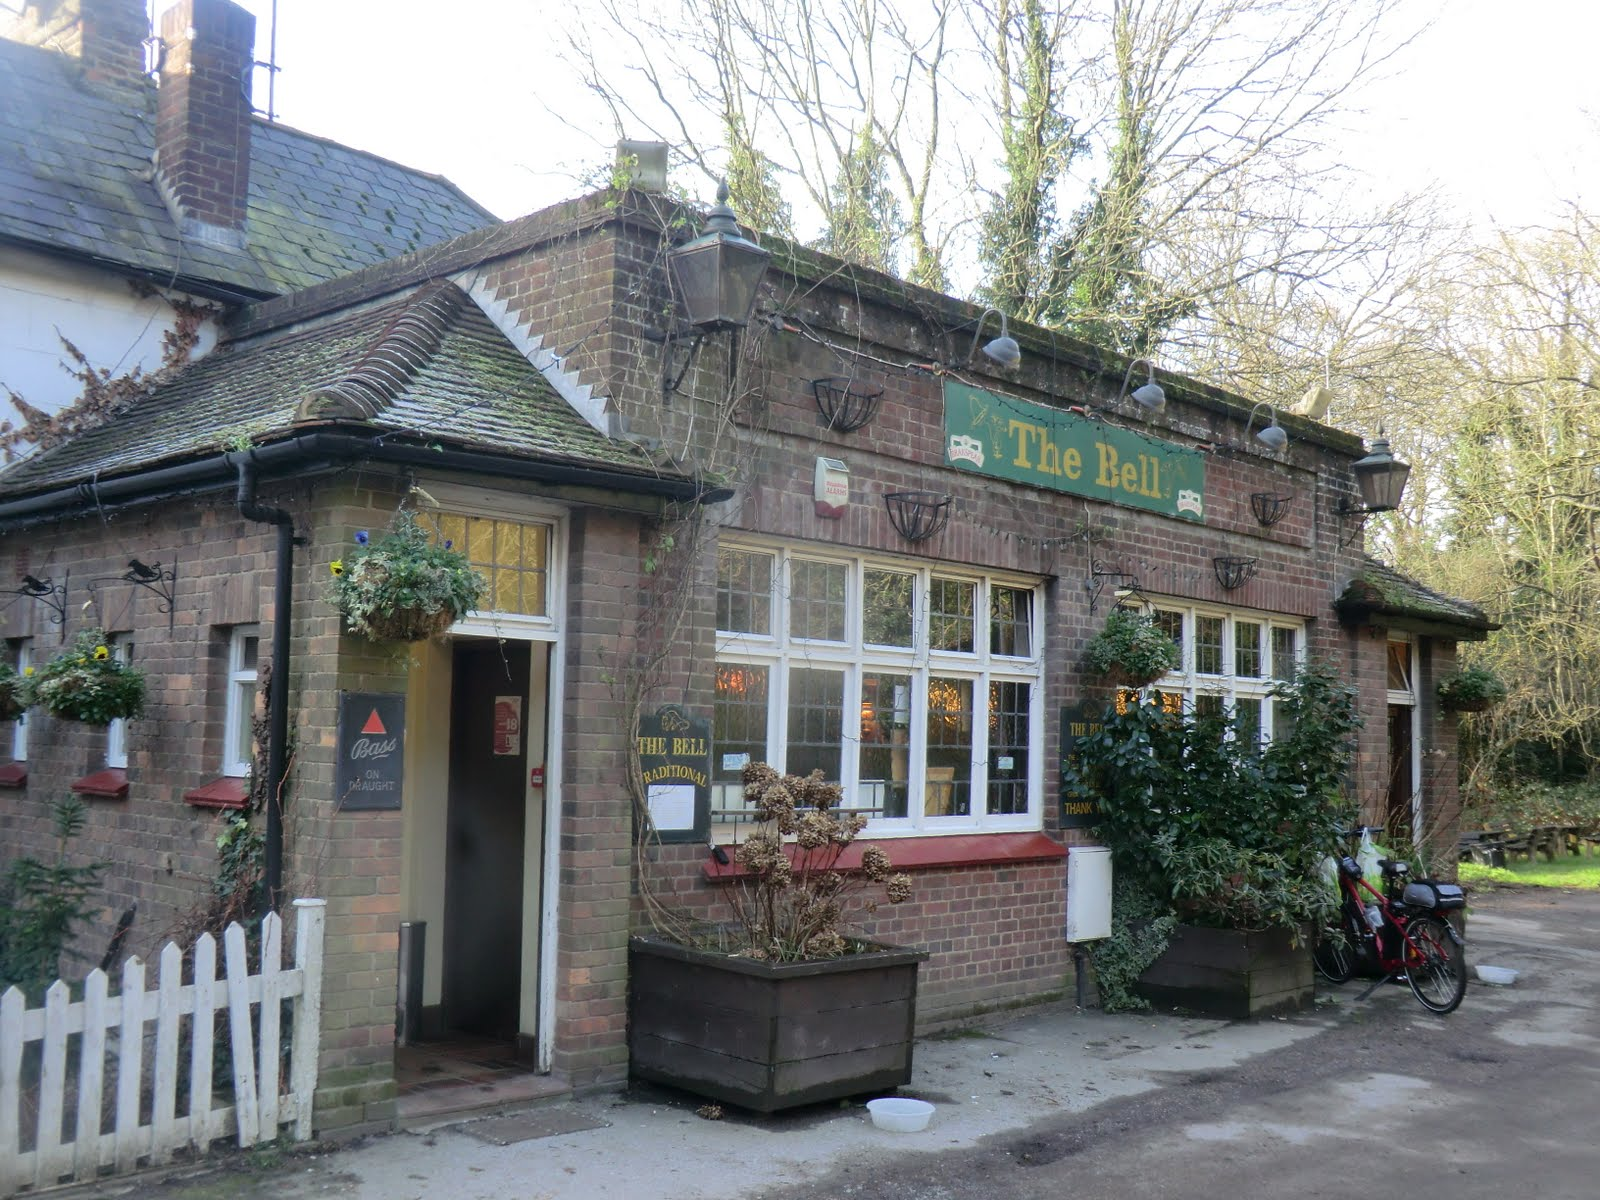 CIMG2224 The Bell pub, Tadworth